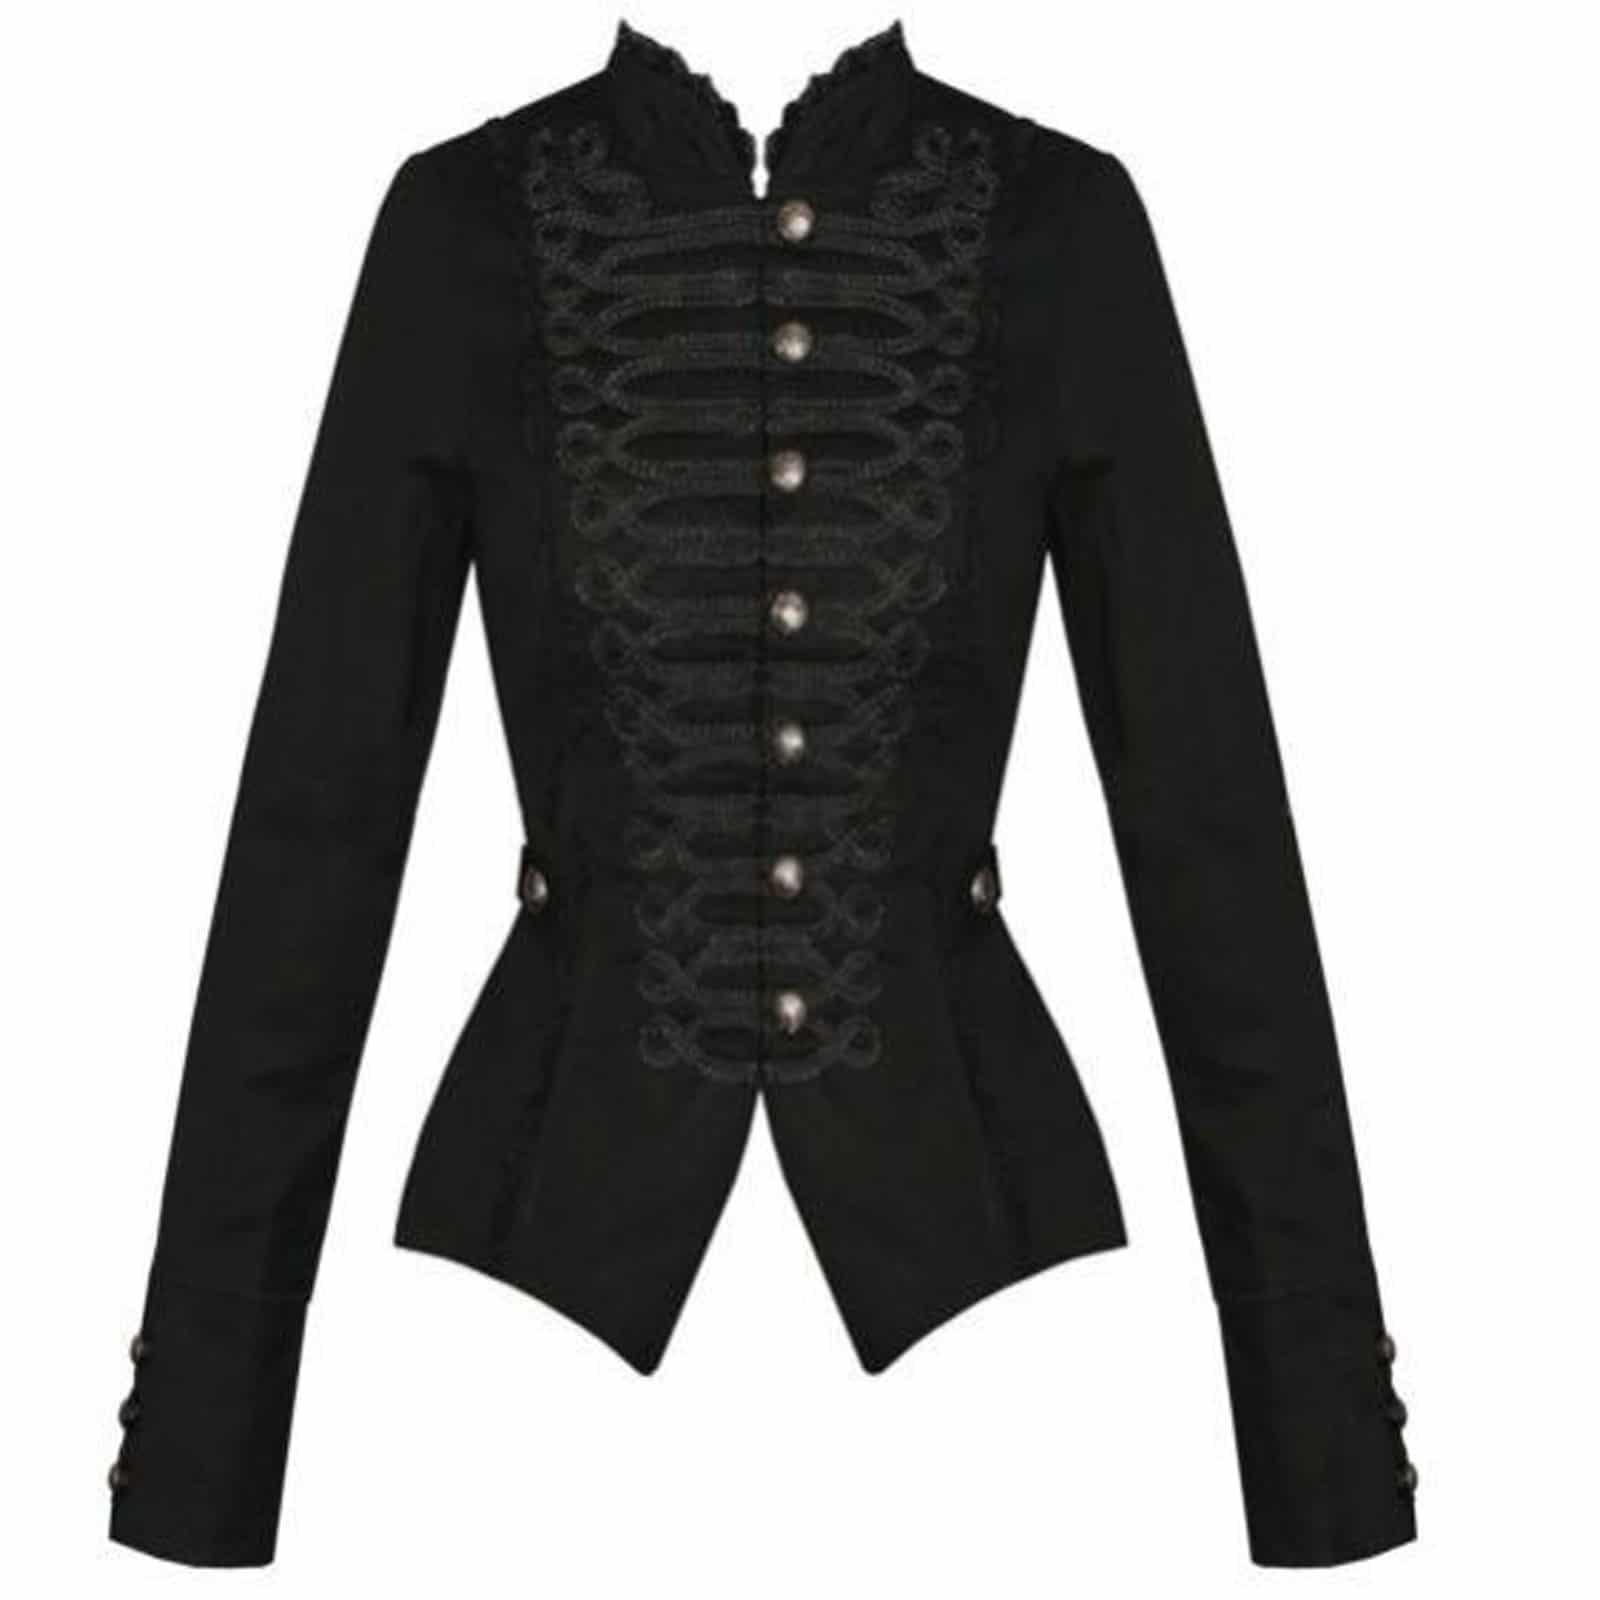 b18b1d4ead6 Black Braided Gothic Corset for Gothic Steampunk - Kilt and Jacks